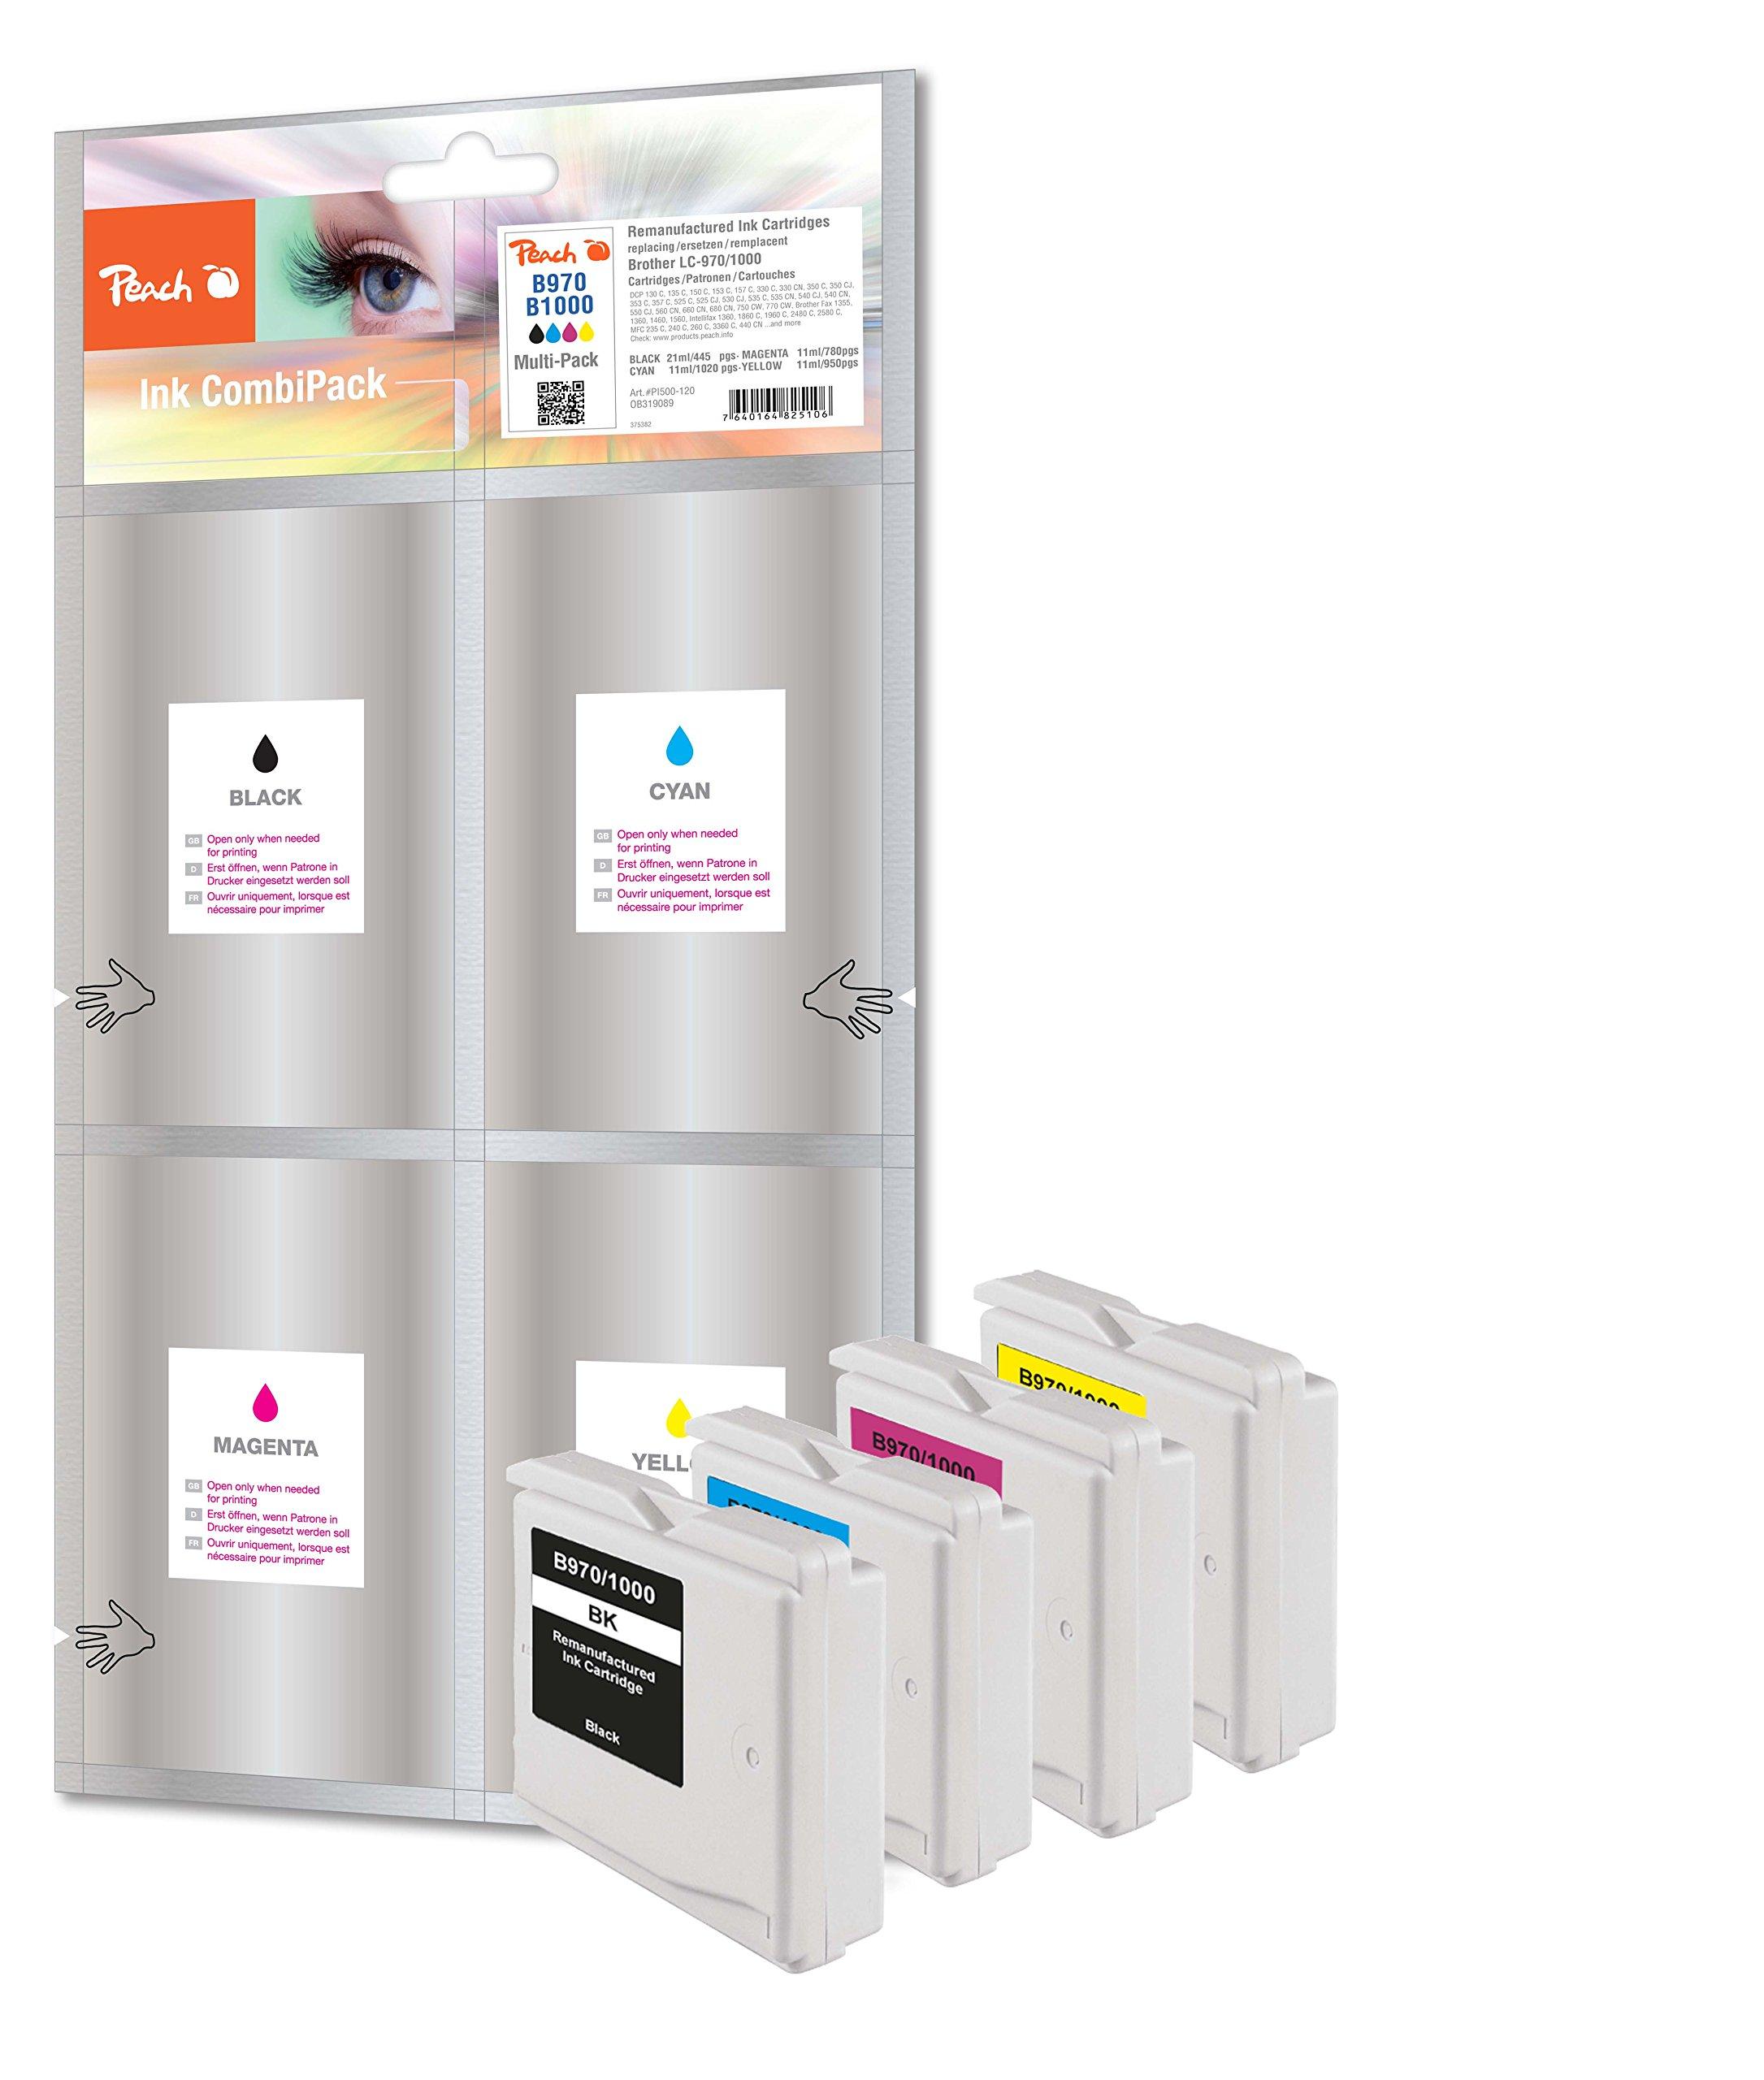 Peach PI500-120 ink cartridge - ink cartridges (Black, Cyan, Yellow, Magenta, High, LC-1000, LC-970